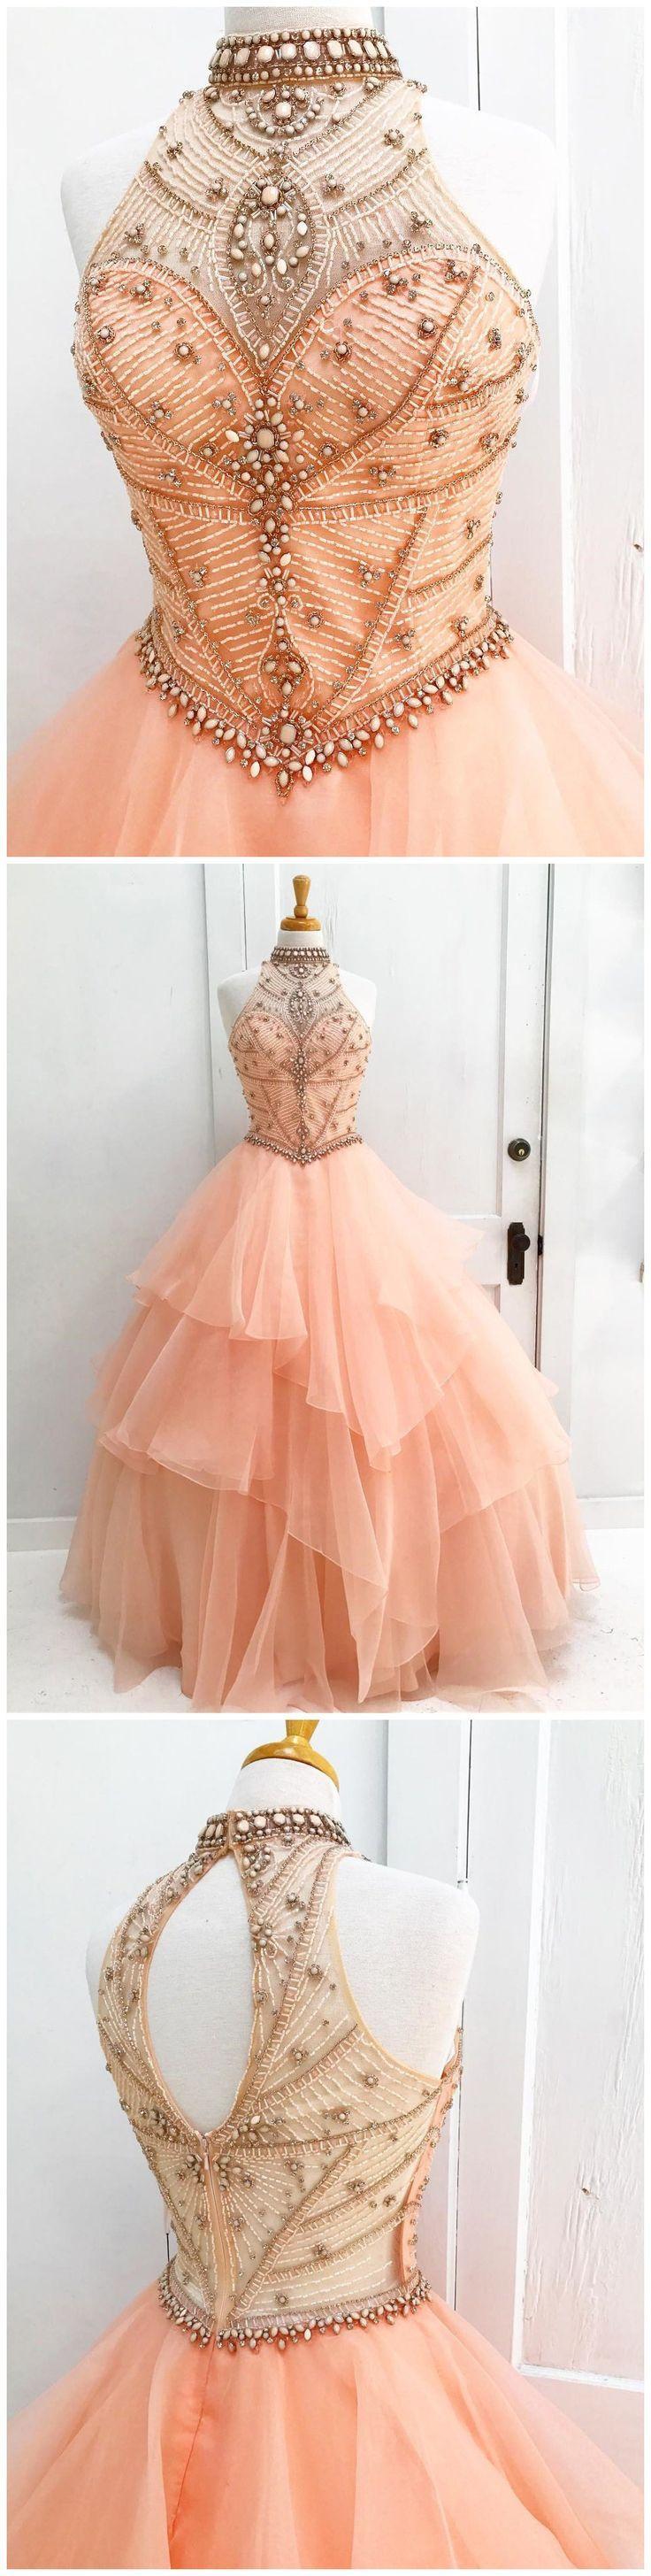 Wedding - Chic A-line High Neck Pearl Pink Beading Modest Long Prom Dress Evening Dress AM551